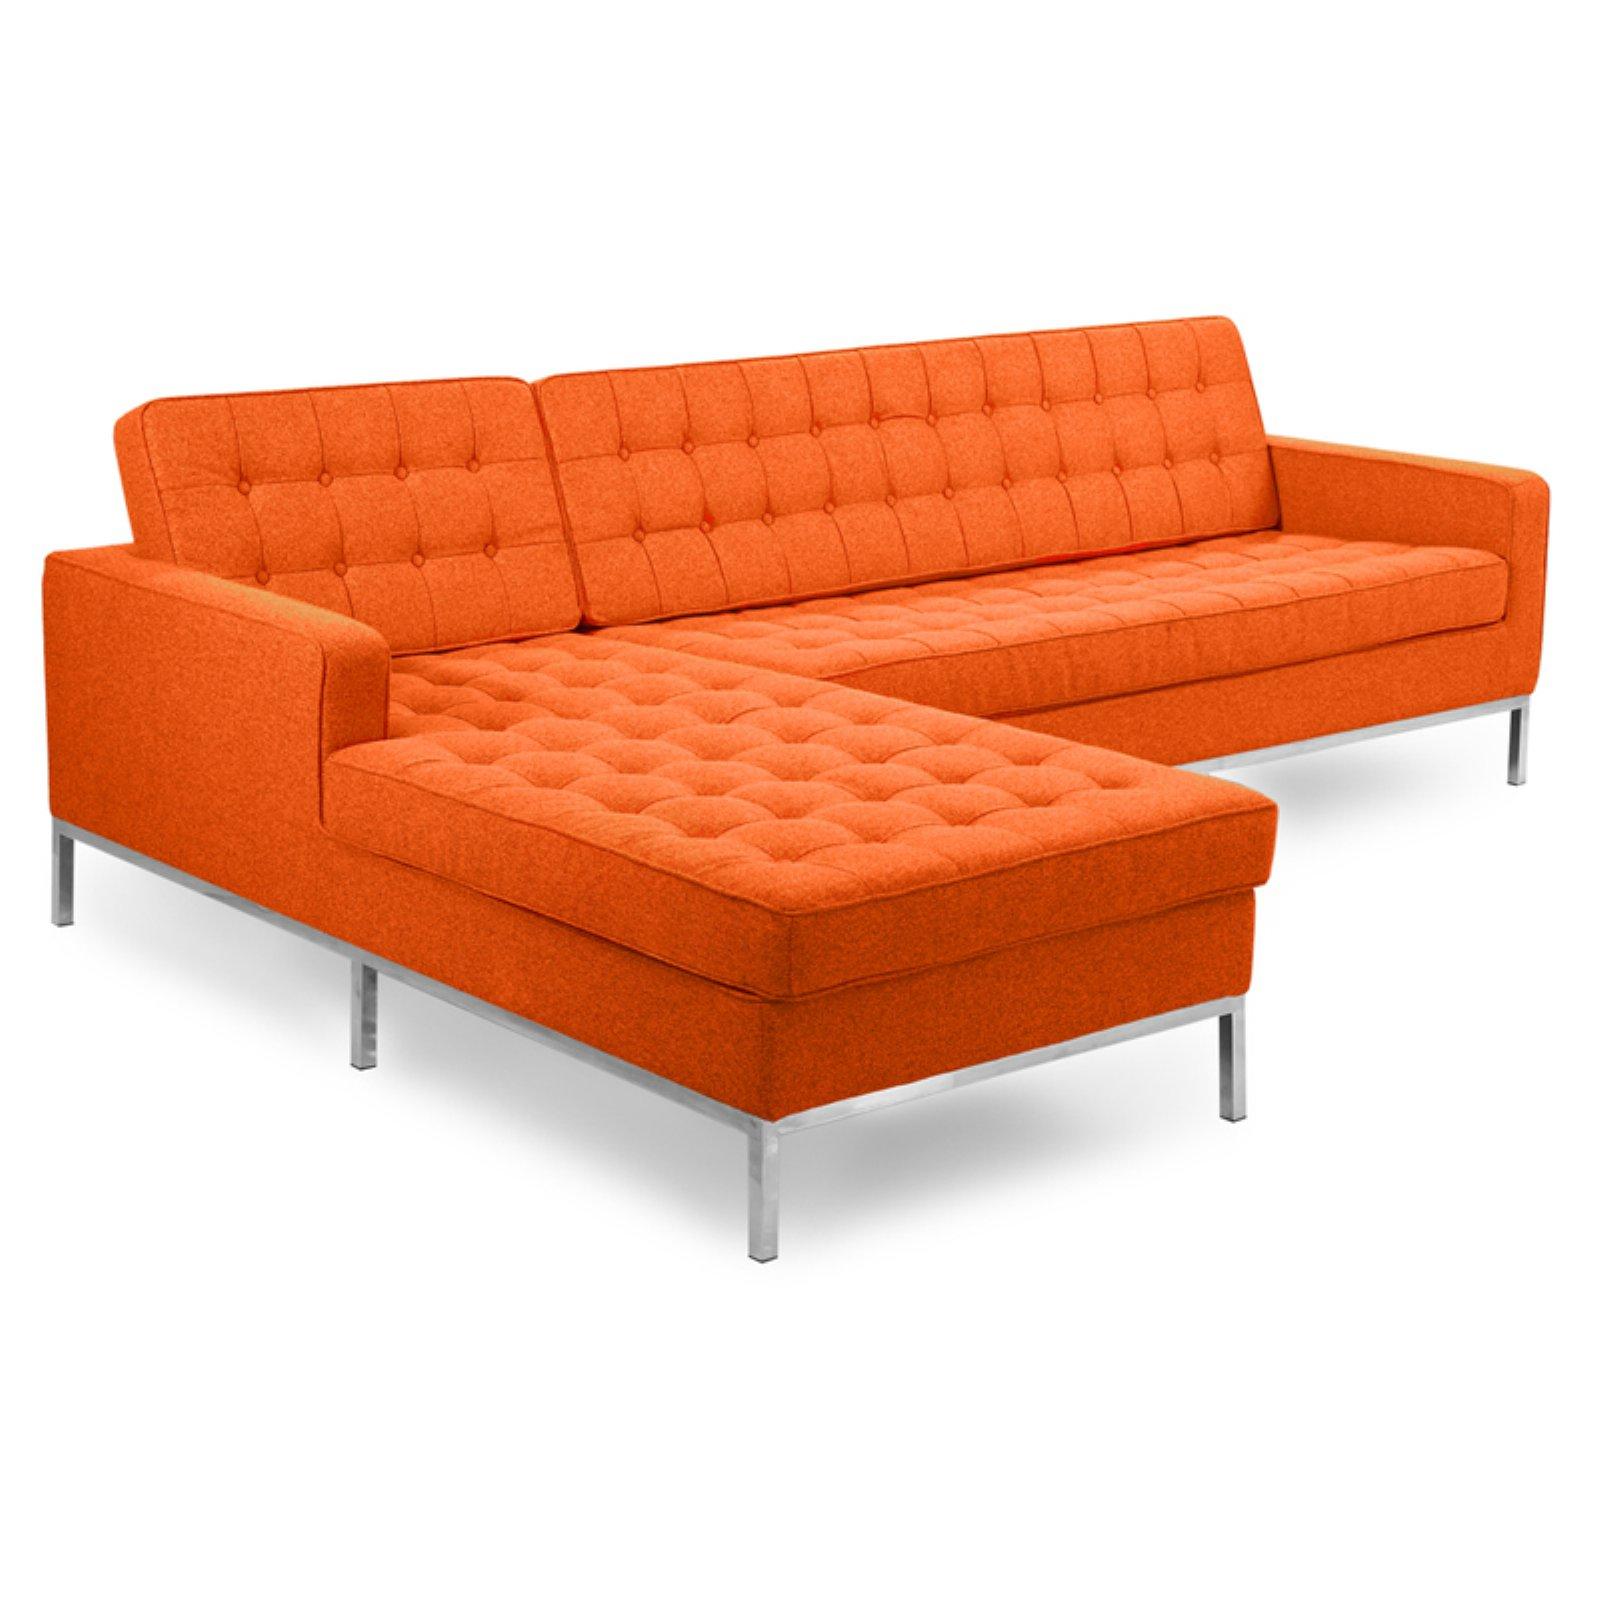 Kardiel Florence Knoll Left Facing Sectional Sofa With Chaise Cinnabar Sectional Sofa With Chaise Sectional Sofa Sectional